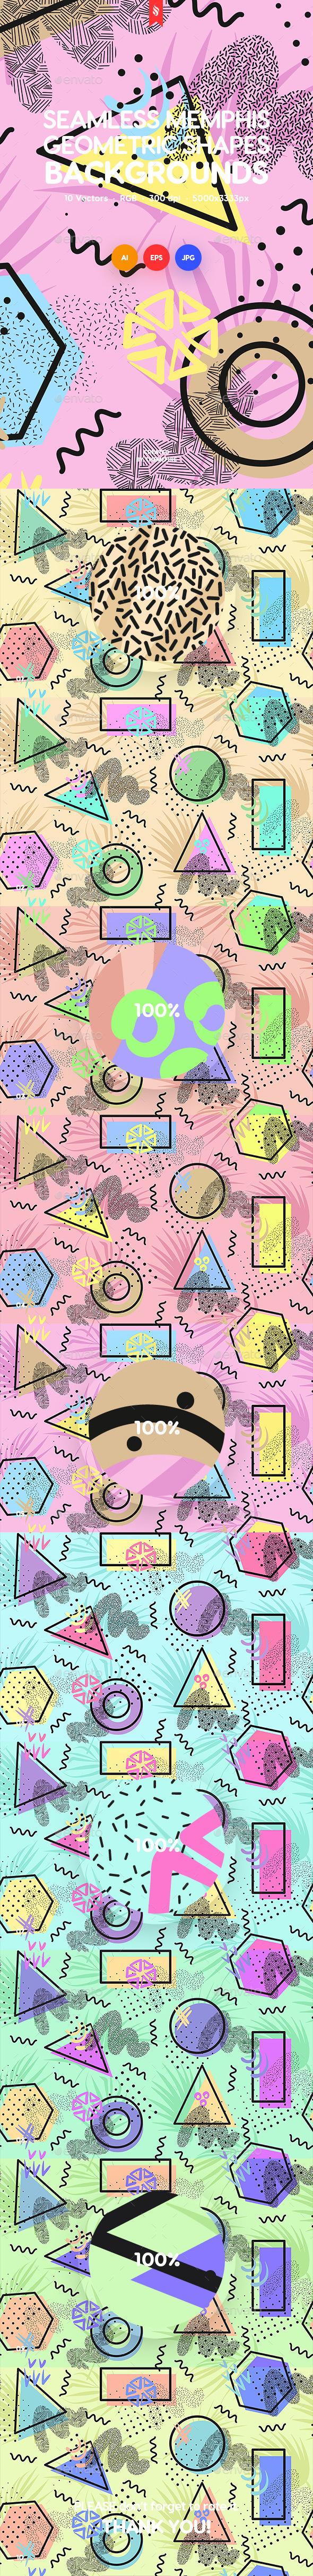 Seamless Memphis Patterns of Geometric Shapes Backgrounds - Patterns Backgrounds